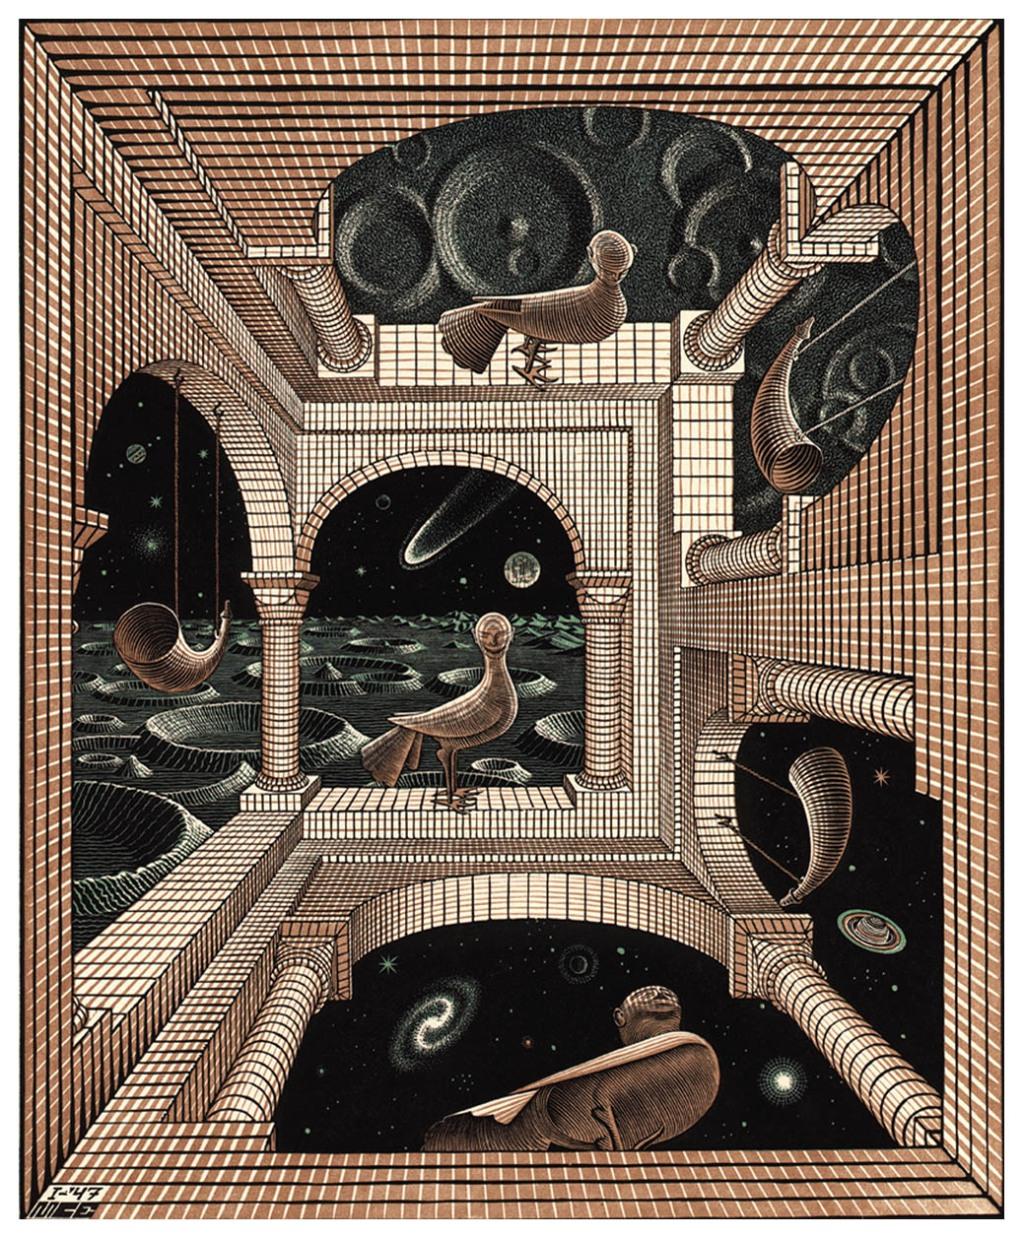 M.C. Escher - Other World 1947